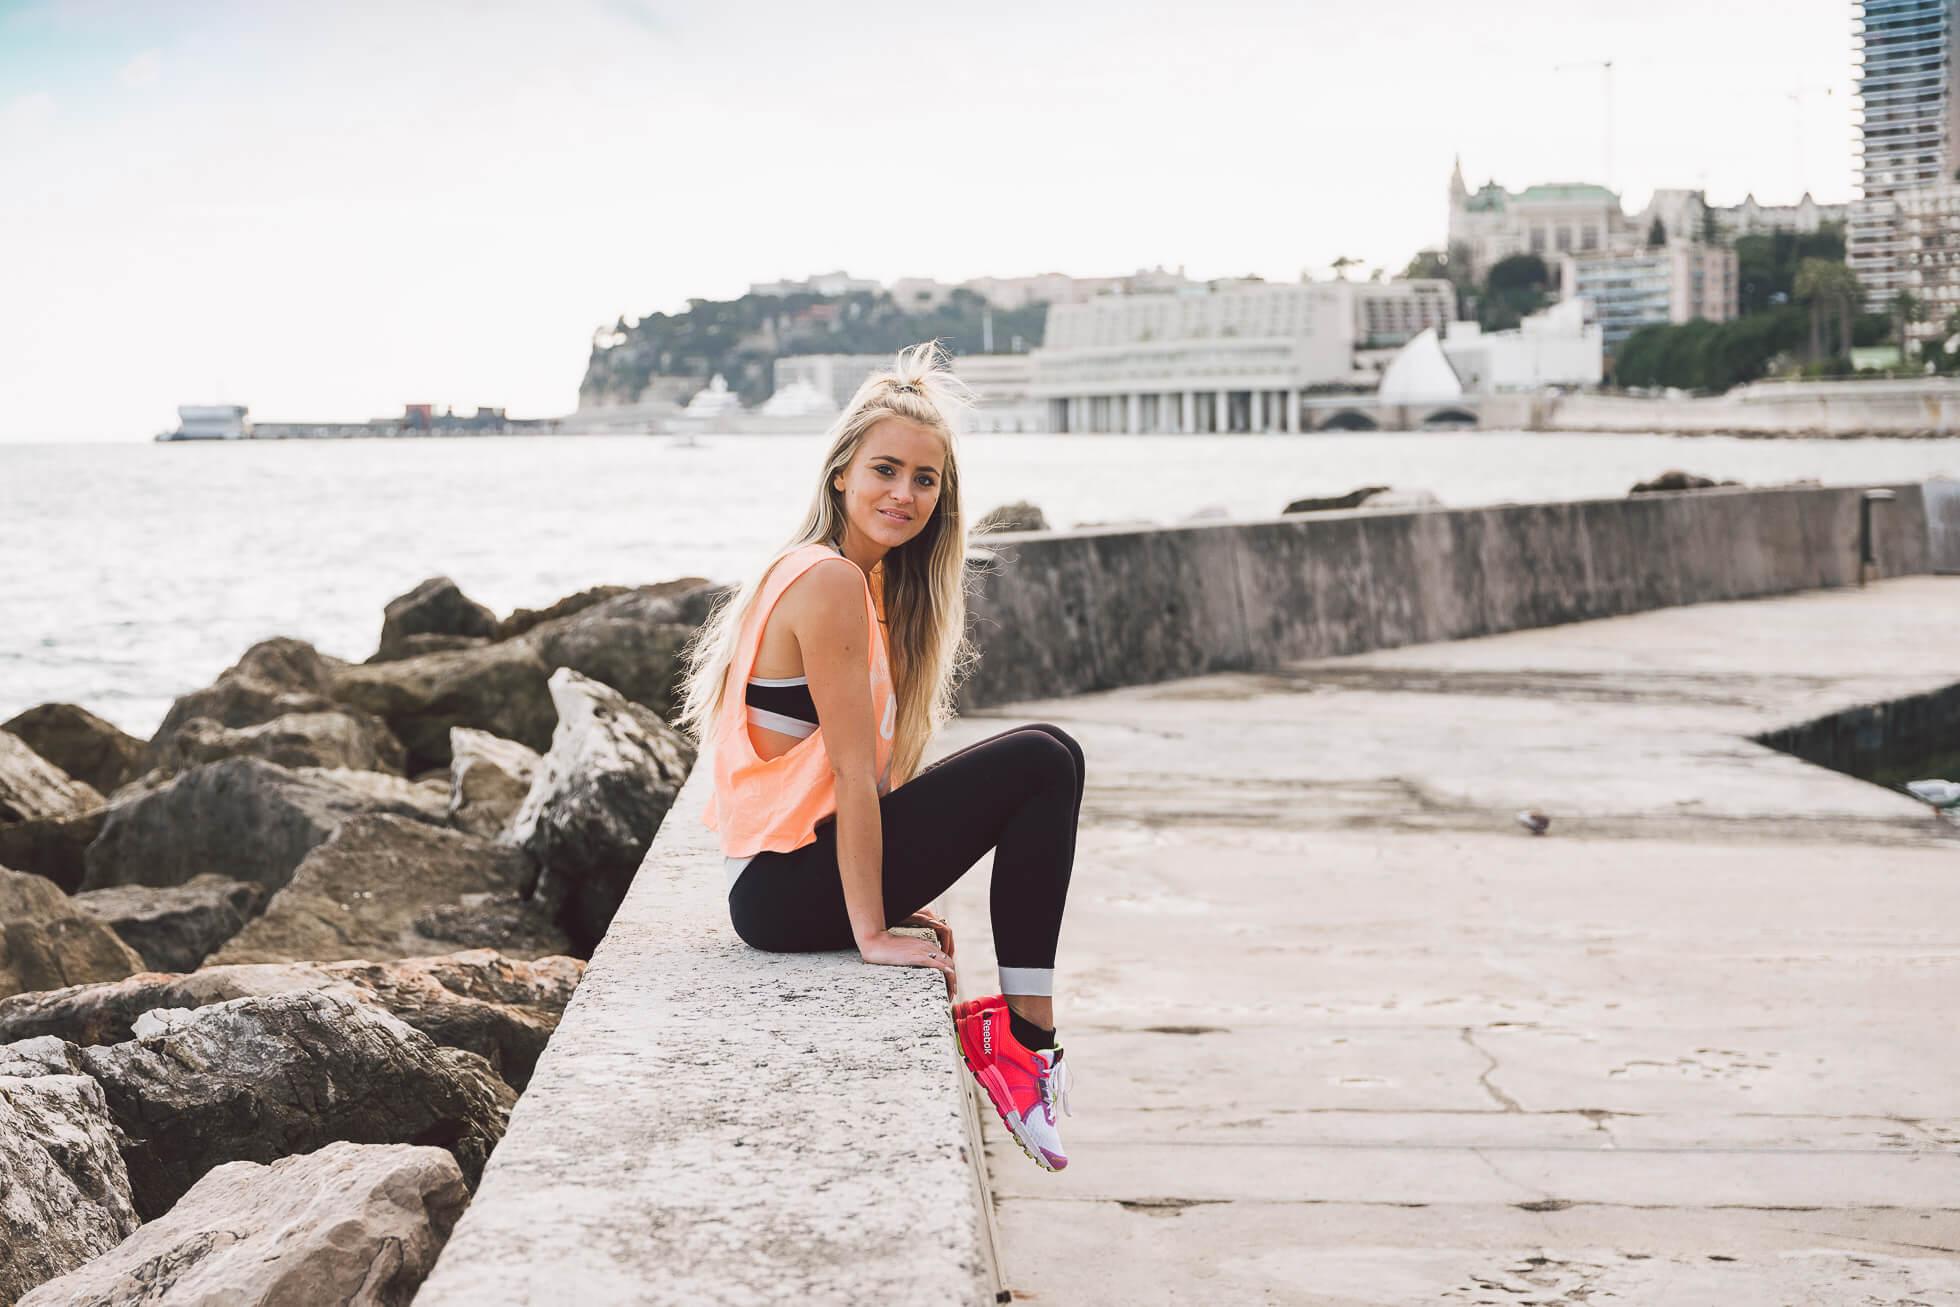 janni-deler-body-weight-workoutL1010130